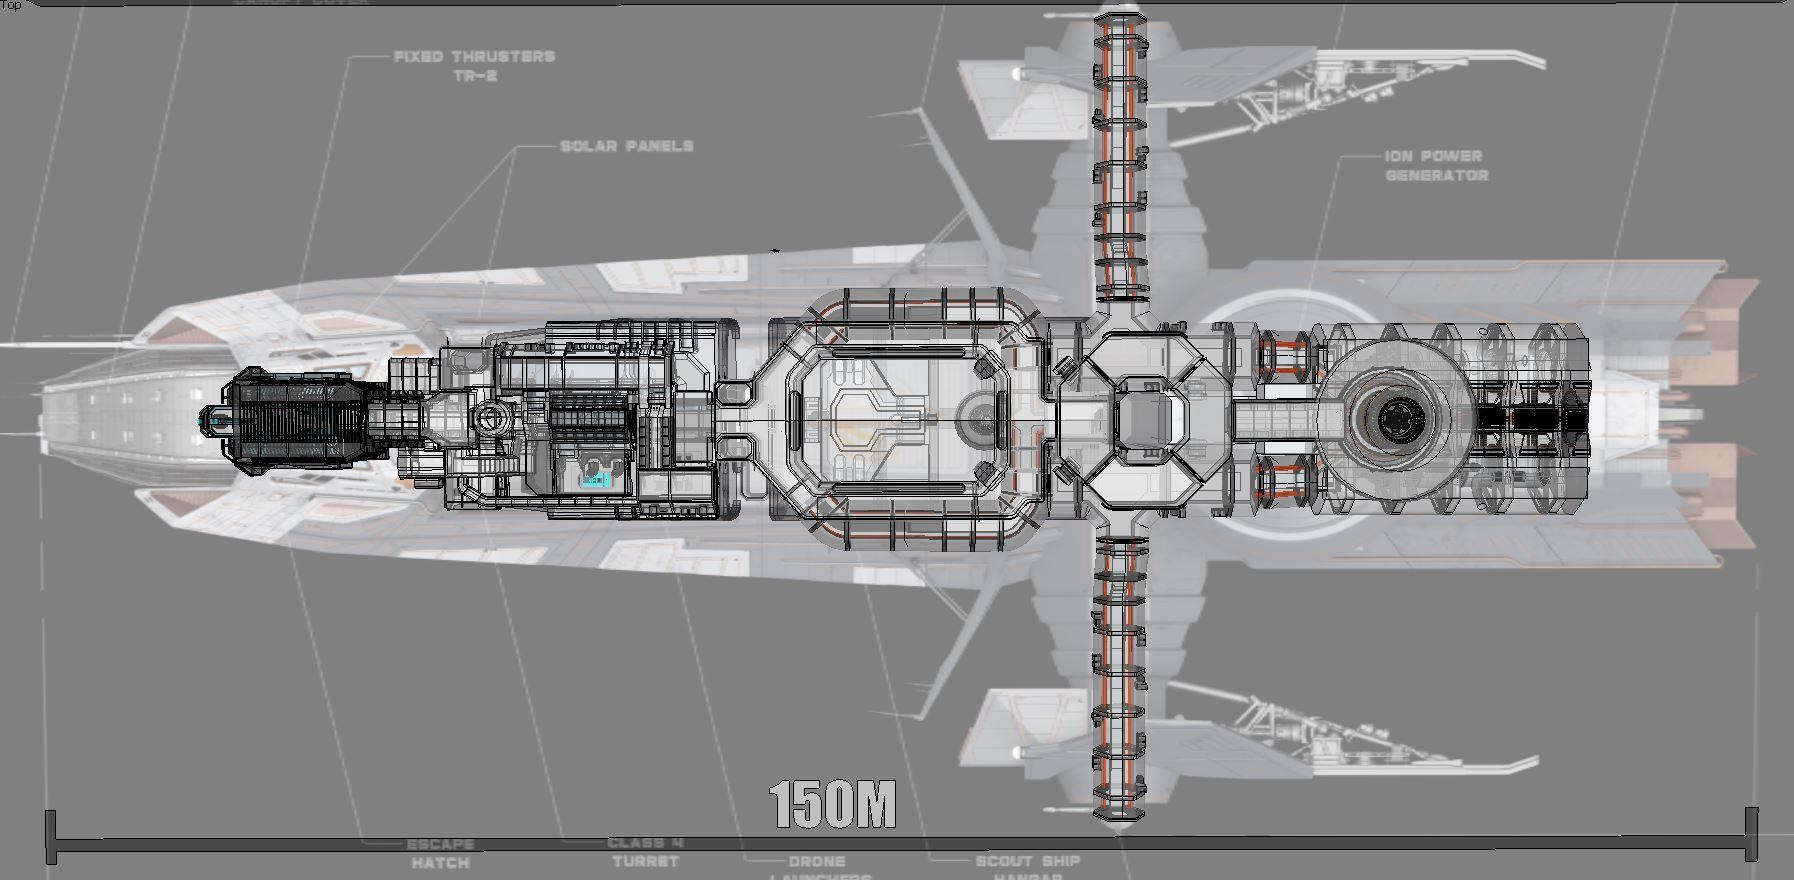 Pin On Spaceships